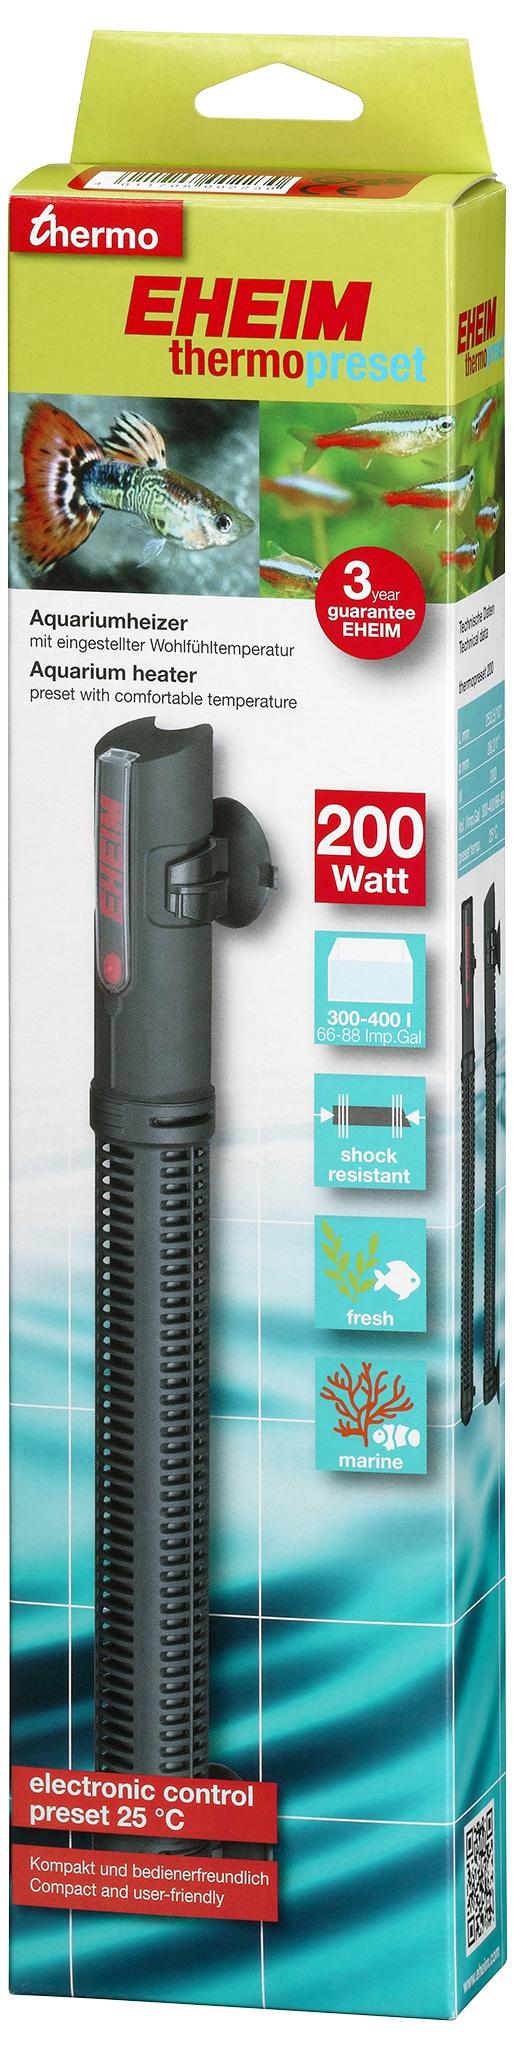 Topítko EHEIM Thermopreset 200W,300-400l